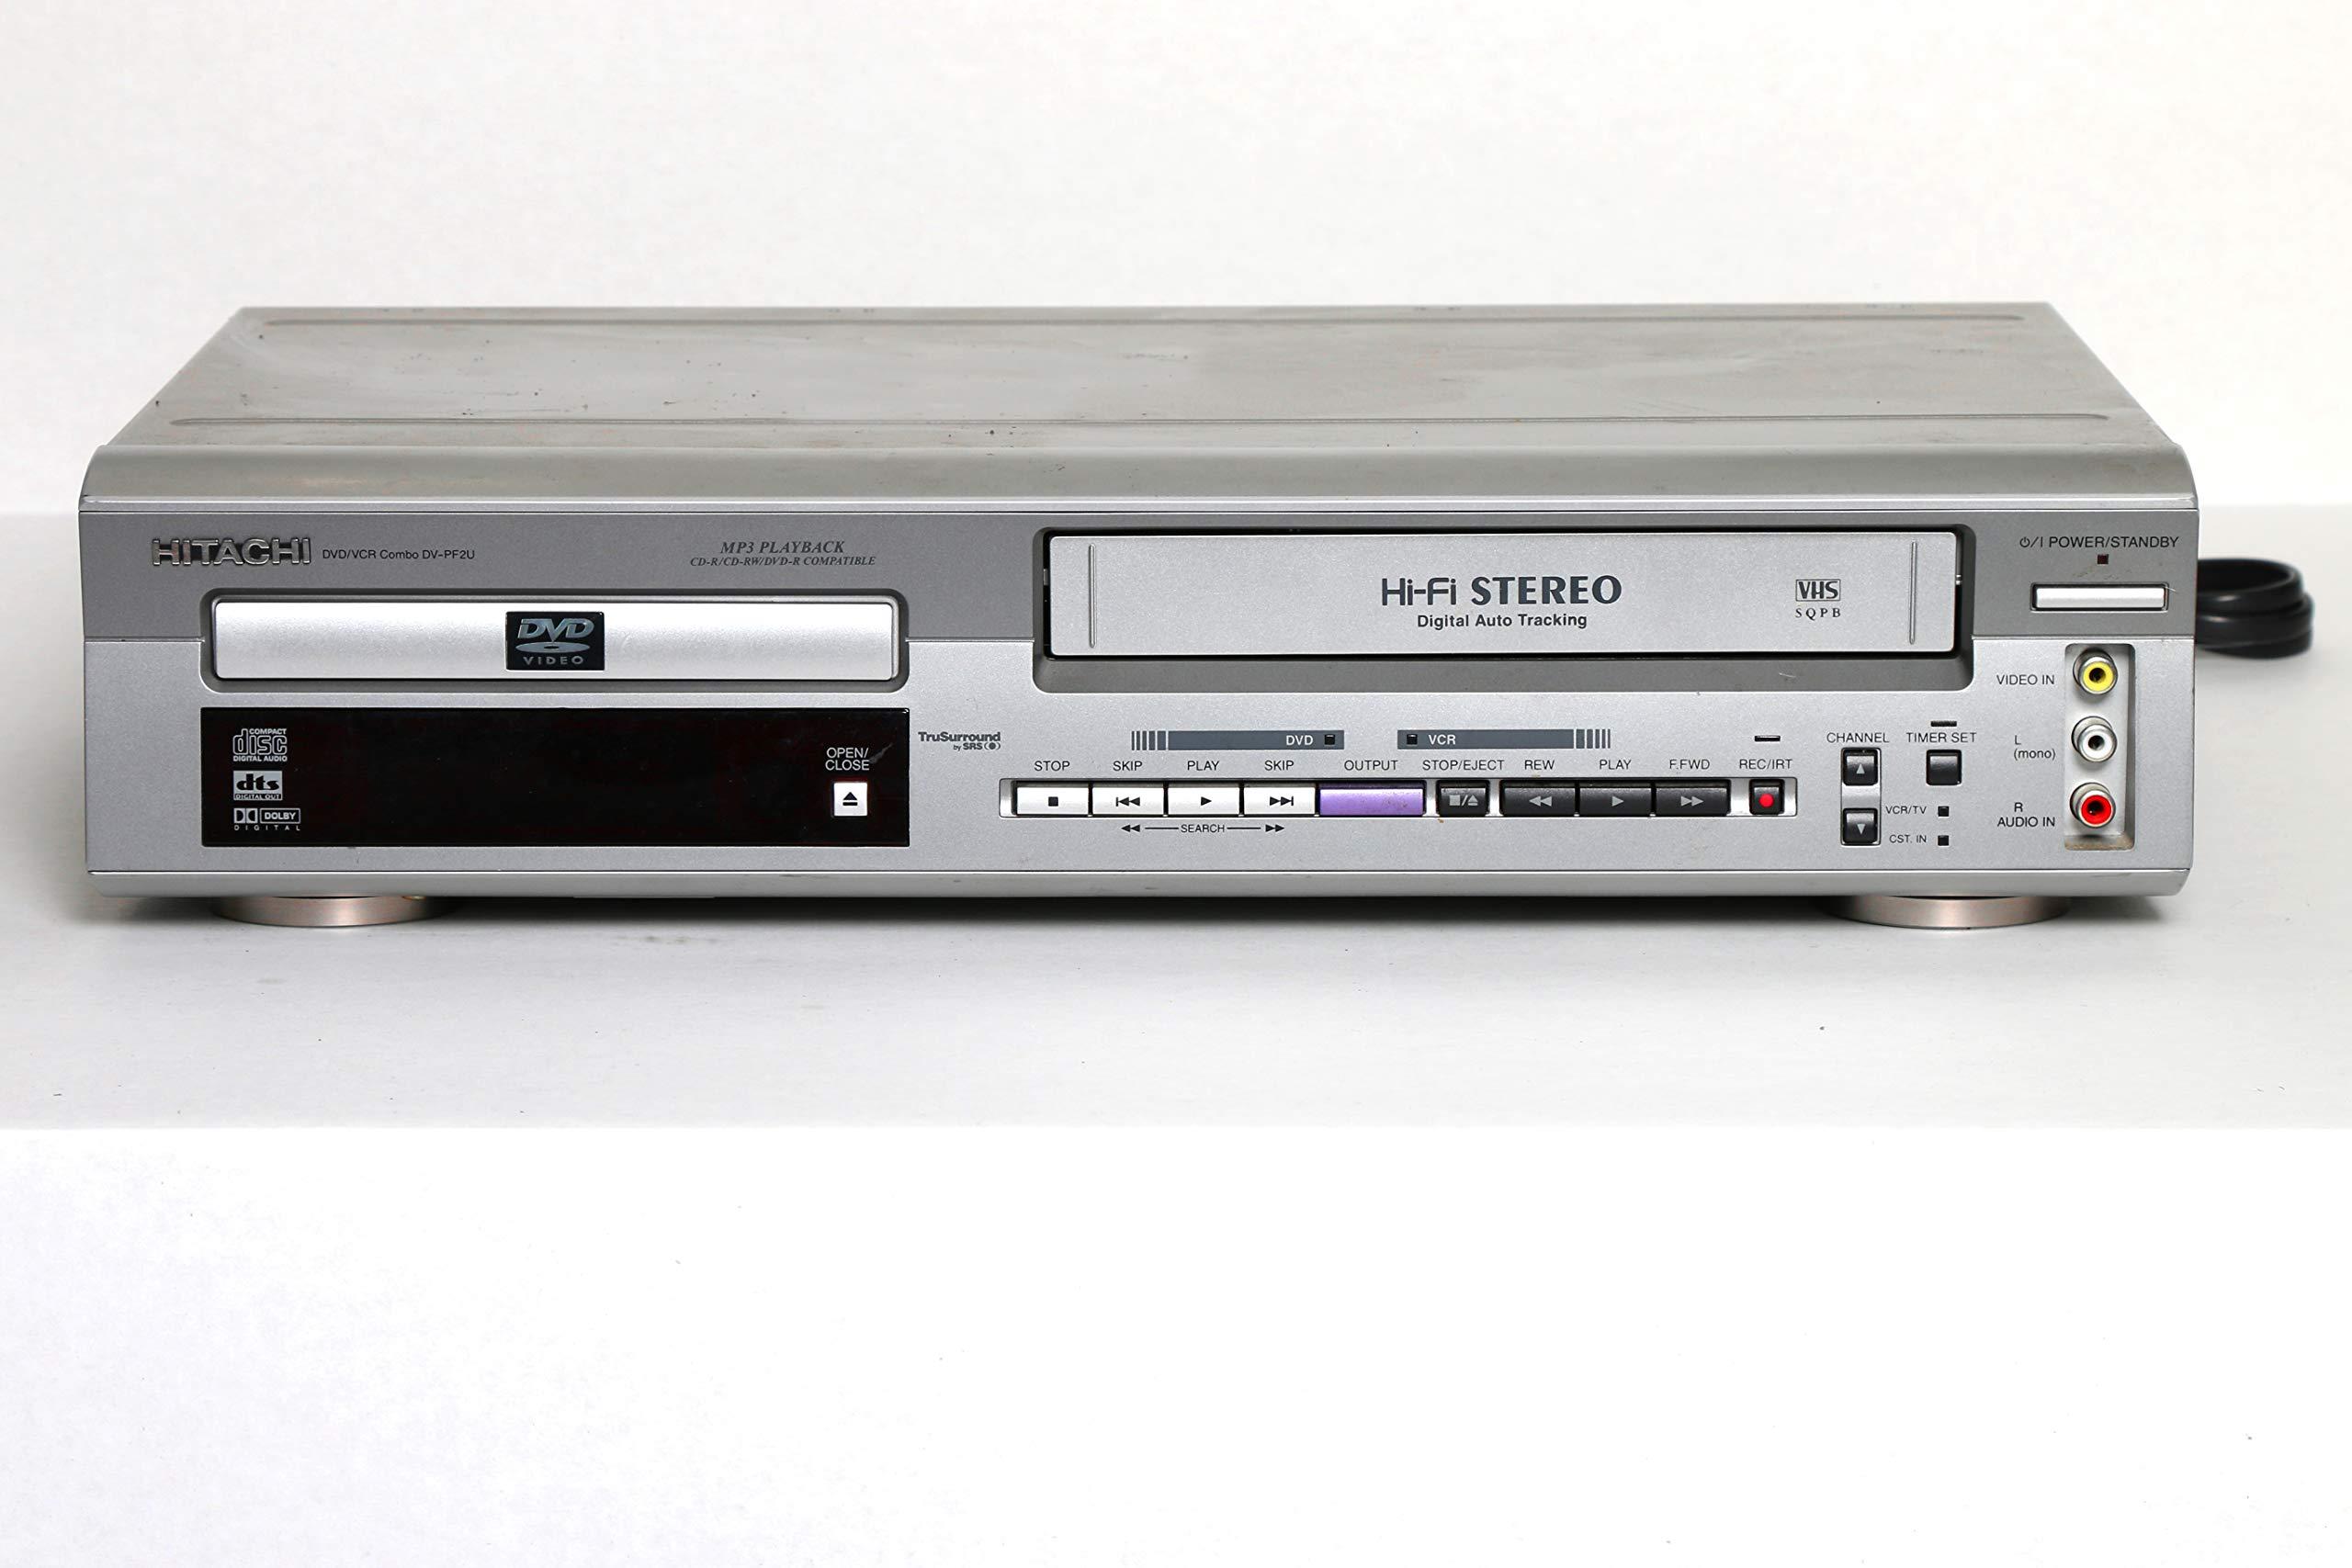 Hitachi DV-PF2U DVD/VCR Combo DVD Player Video Cassette Recorder Player VCR w/ Hi Fi Stereo & Mp3 Playback